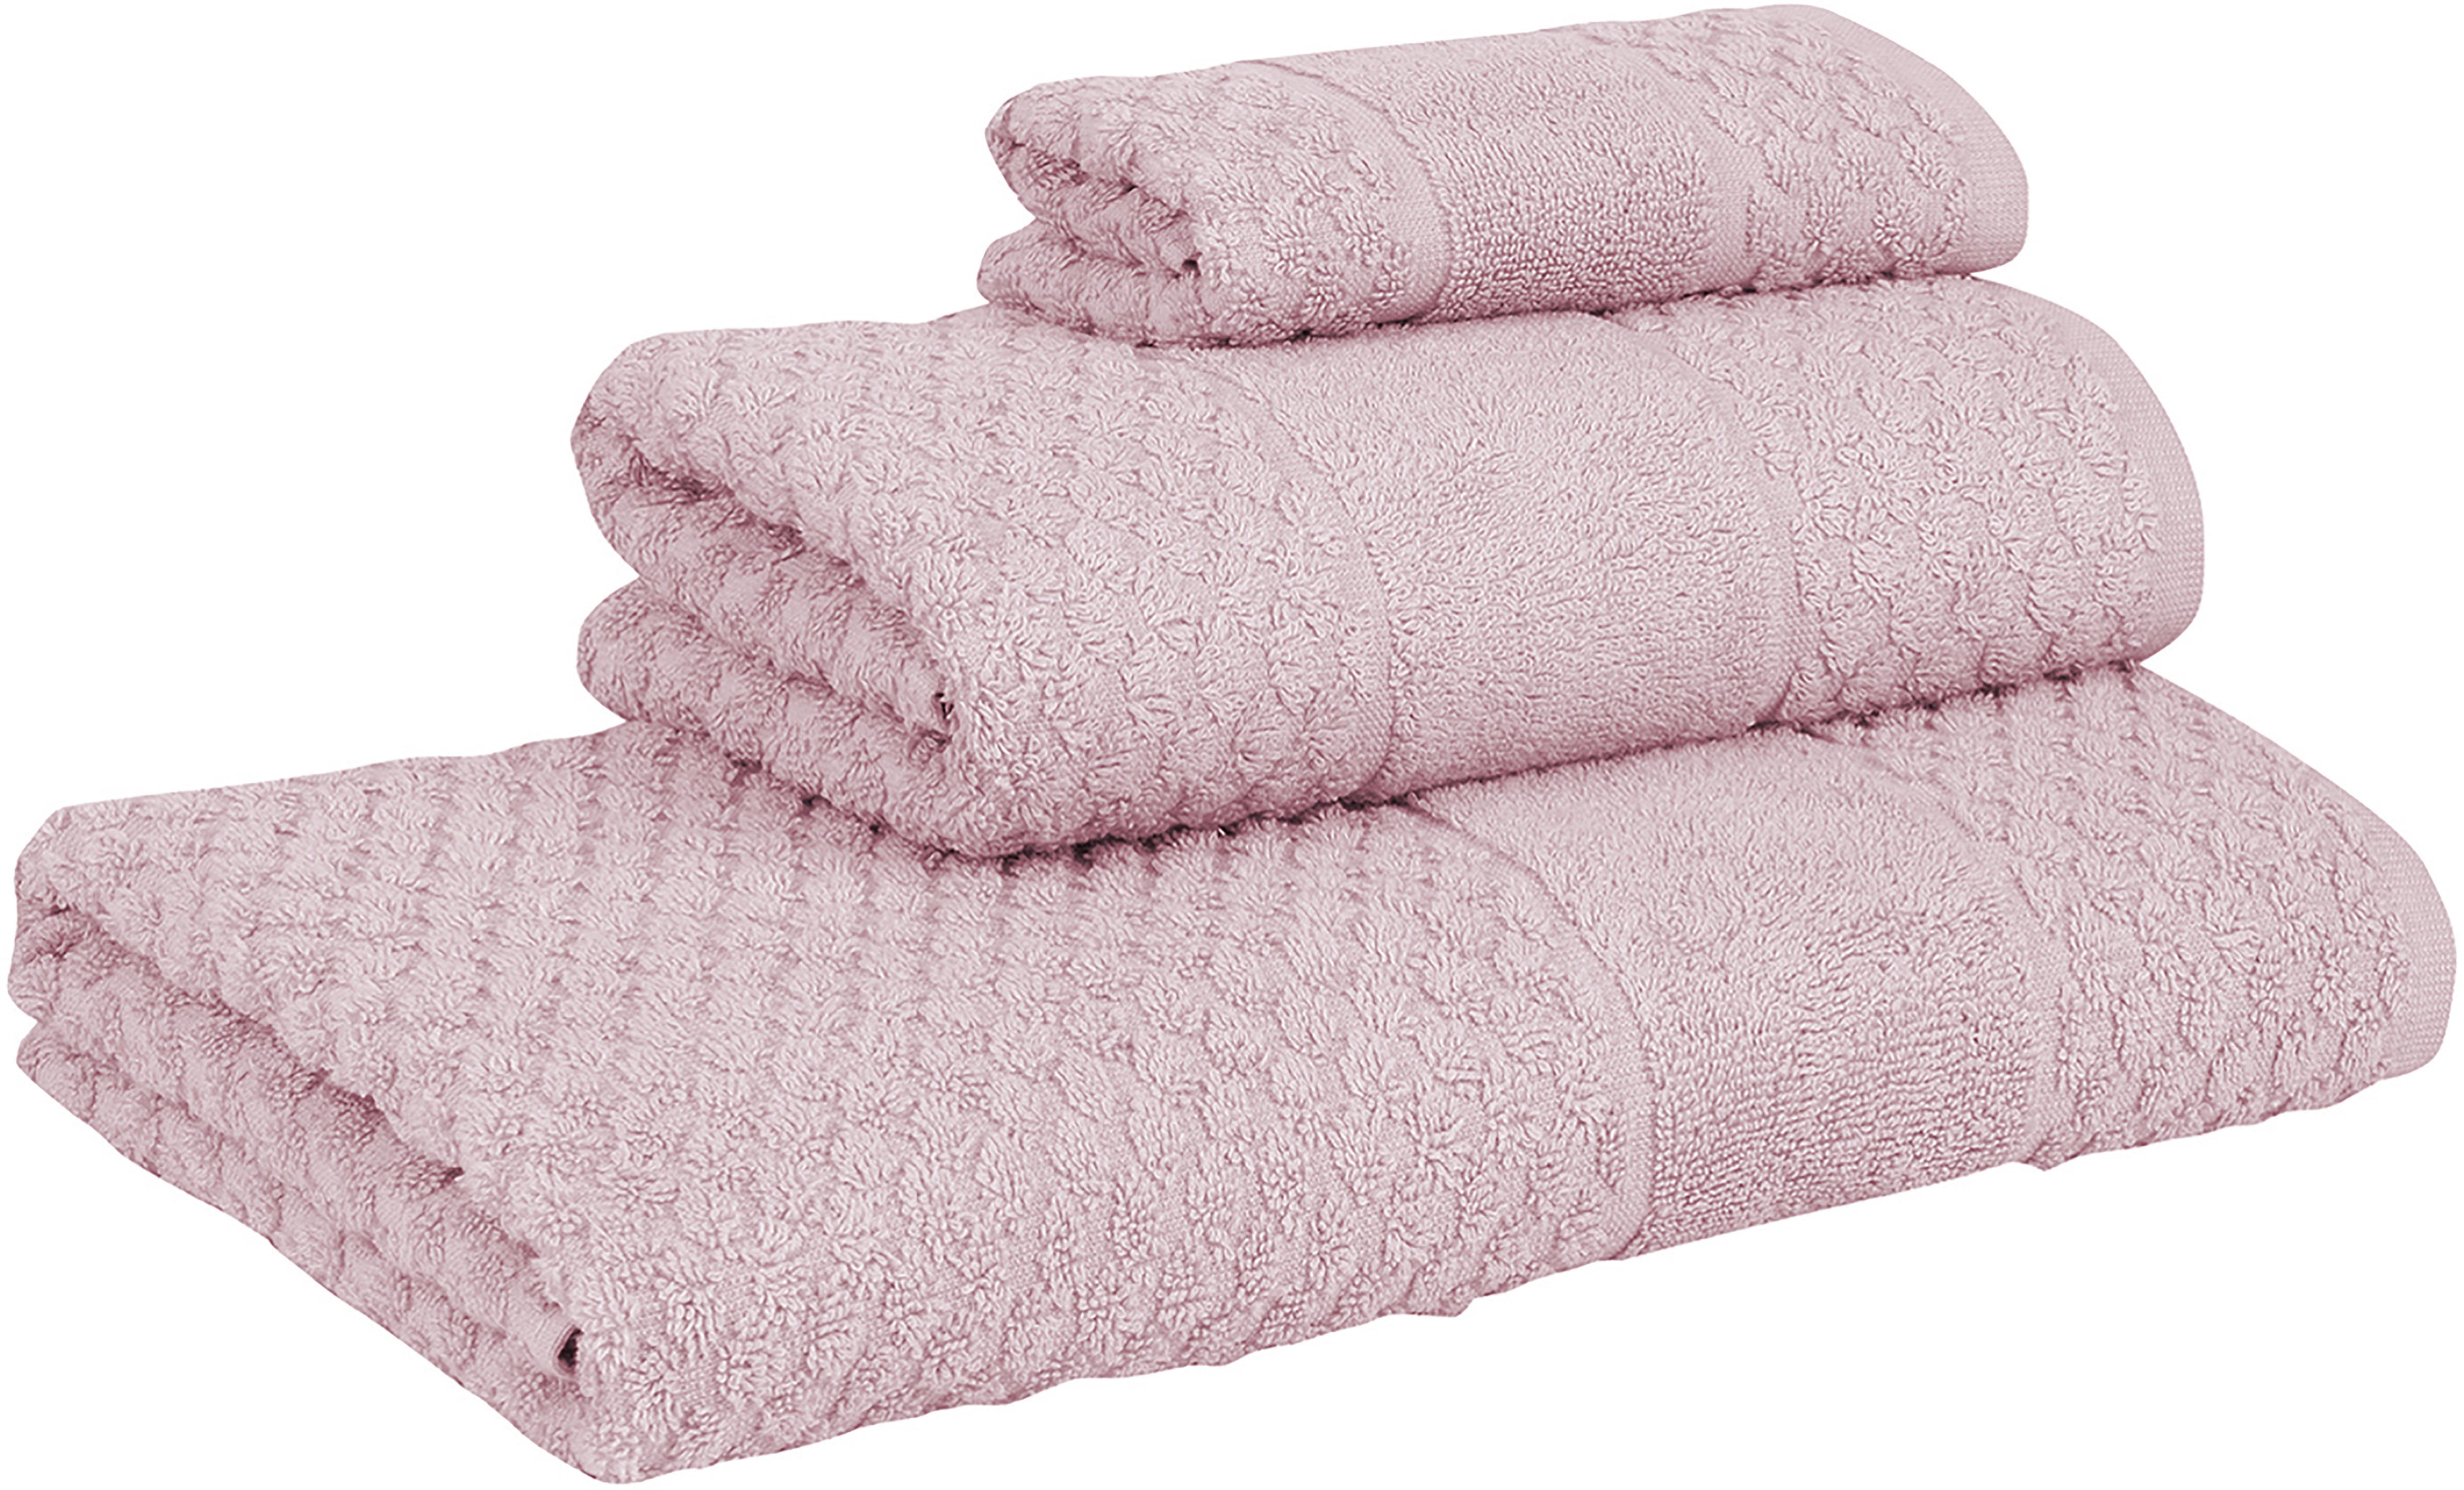 Set de toallas texturizada Katharina, 3pzas., Rosa palo, Tamaños diferentes